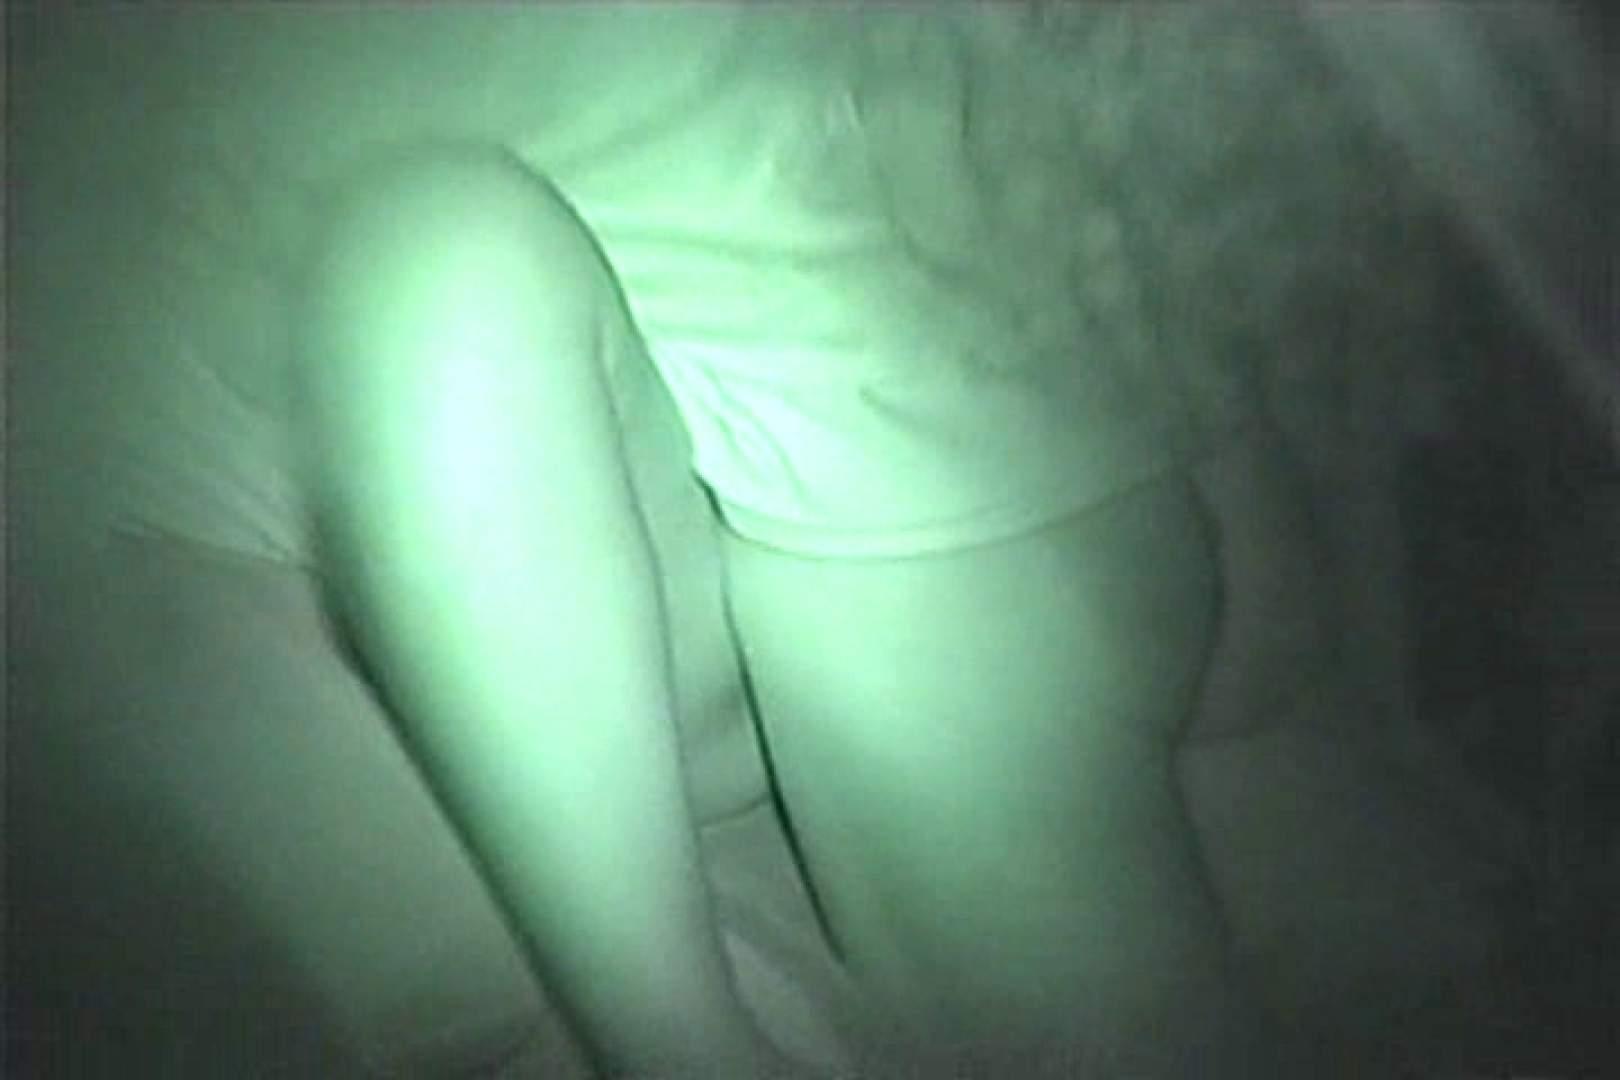 MASAさんの待ち伏せ撮り! 赤外線カーセックスVol.17 カップル ヌード画像 89pic 15